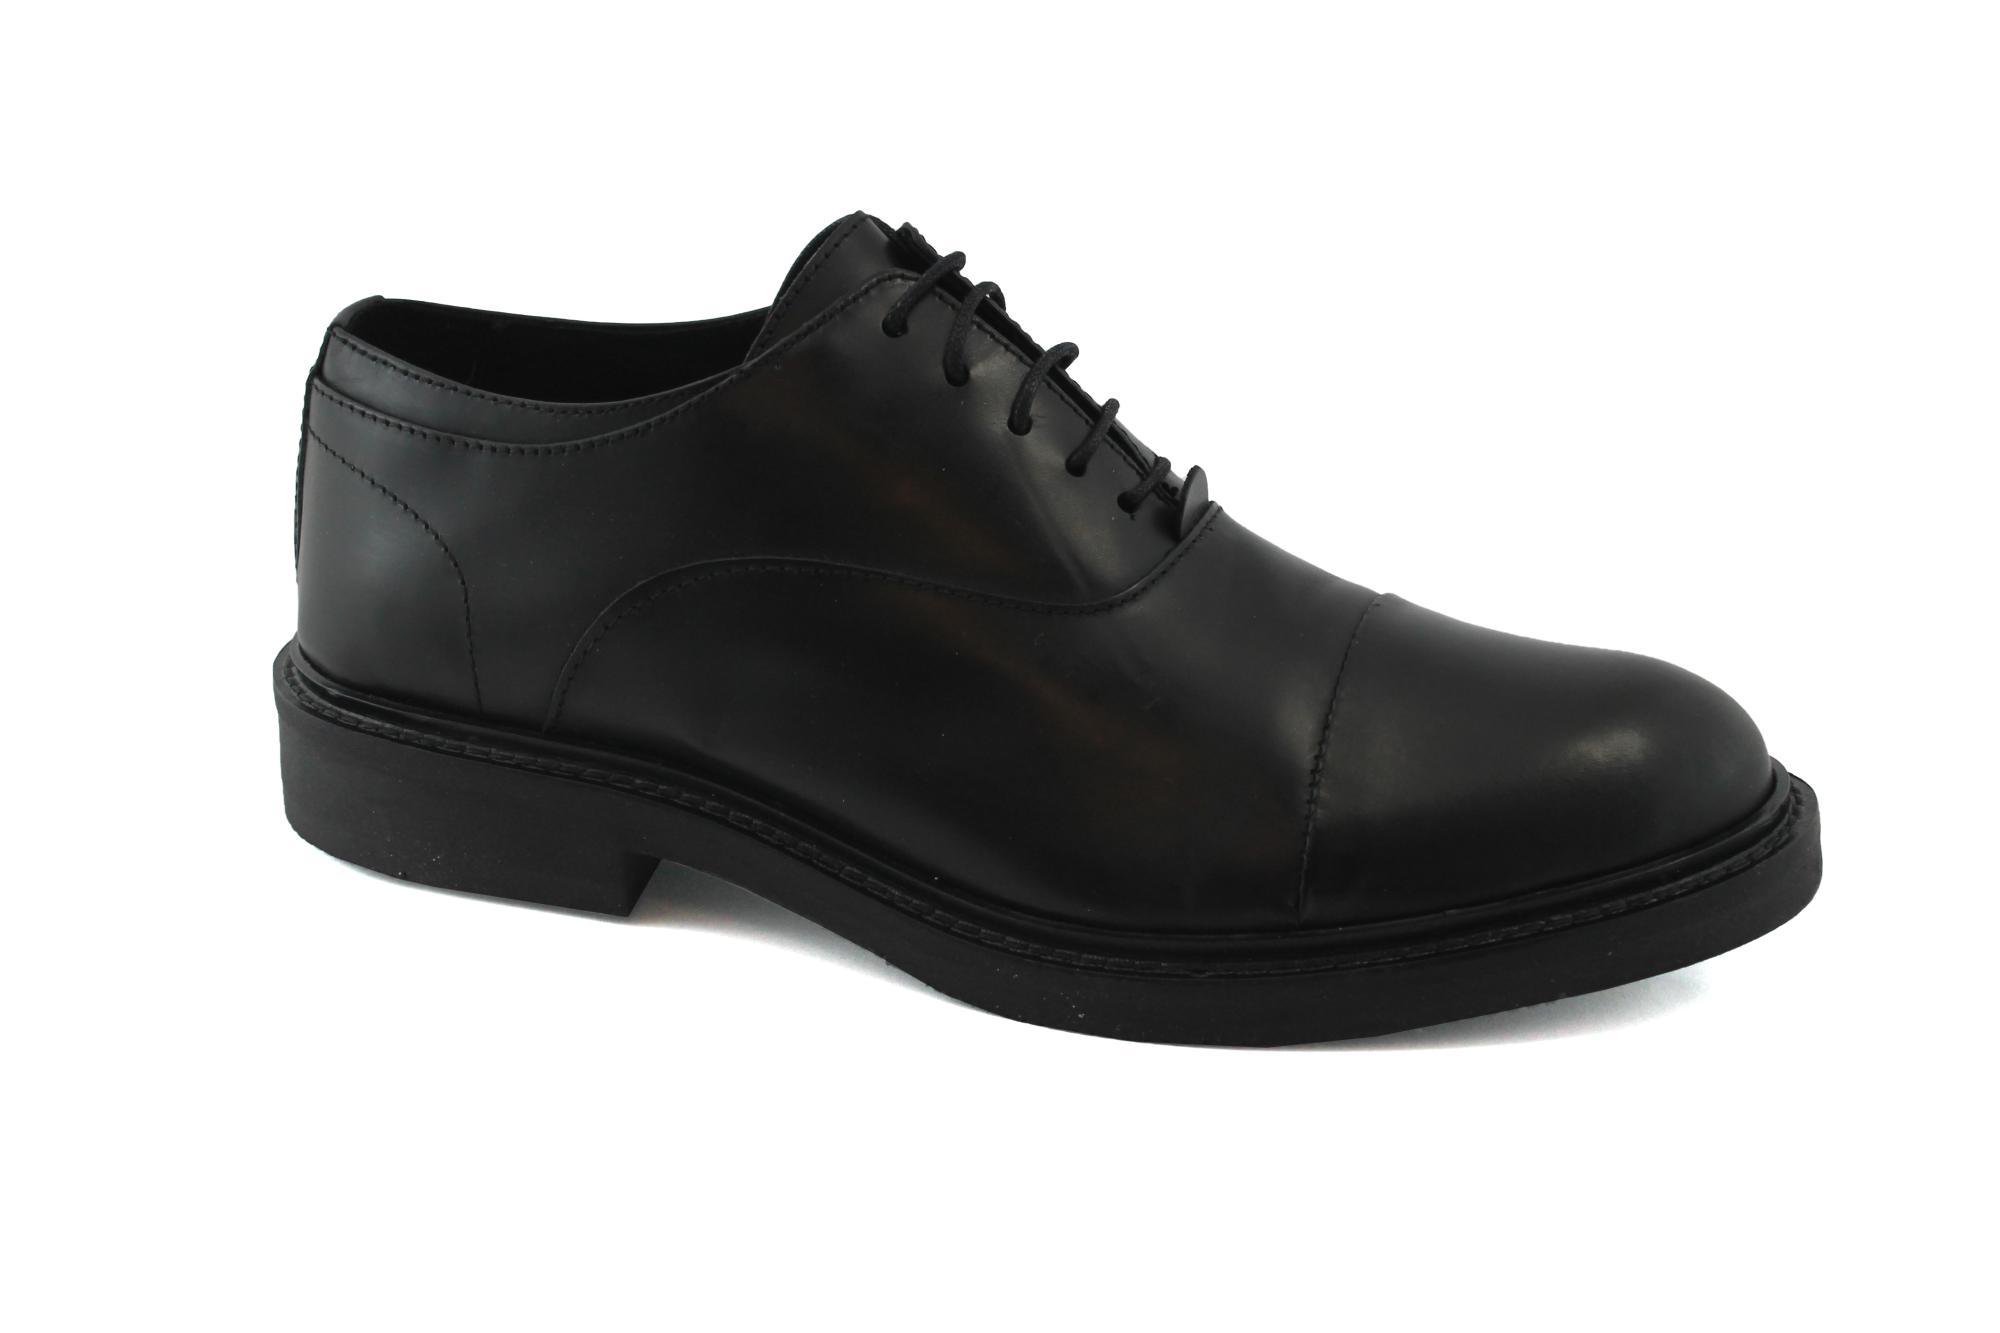 CAFè NOIR PF125 nero scarpe uomo eleganti  puntale pelle lacci